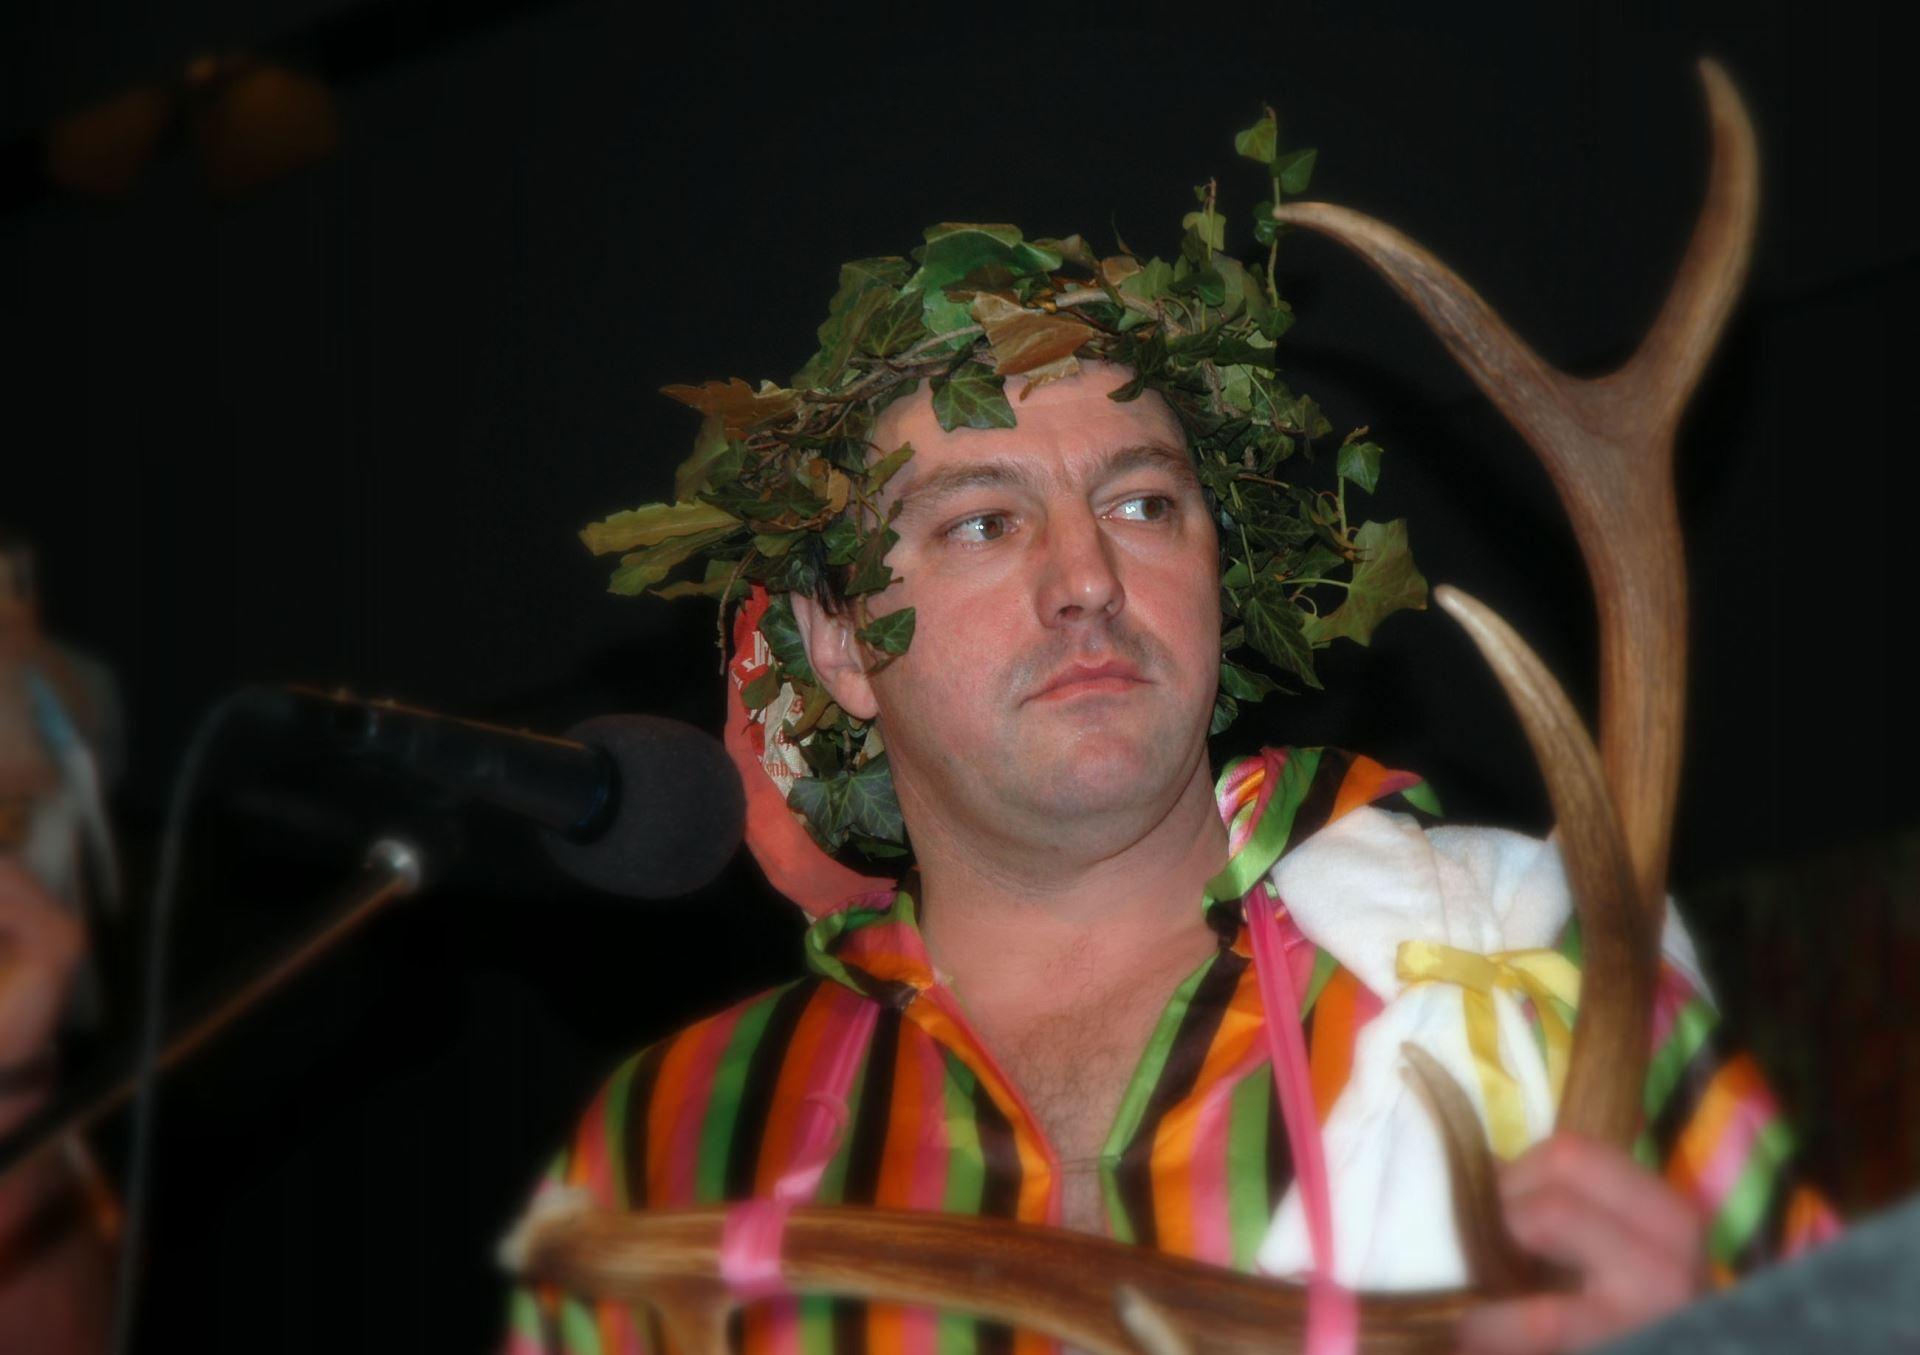 Fasentsitzung in Langenbrand 2005 (50)